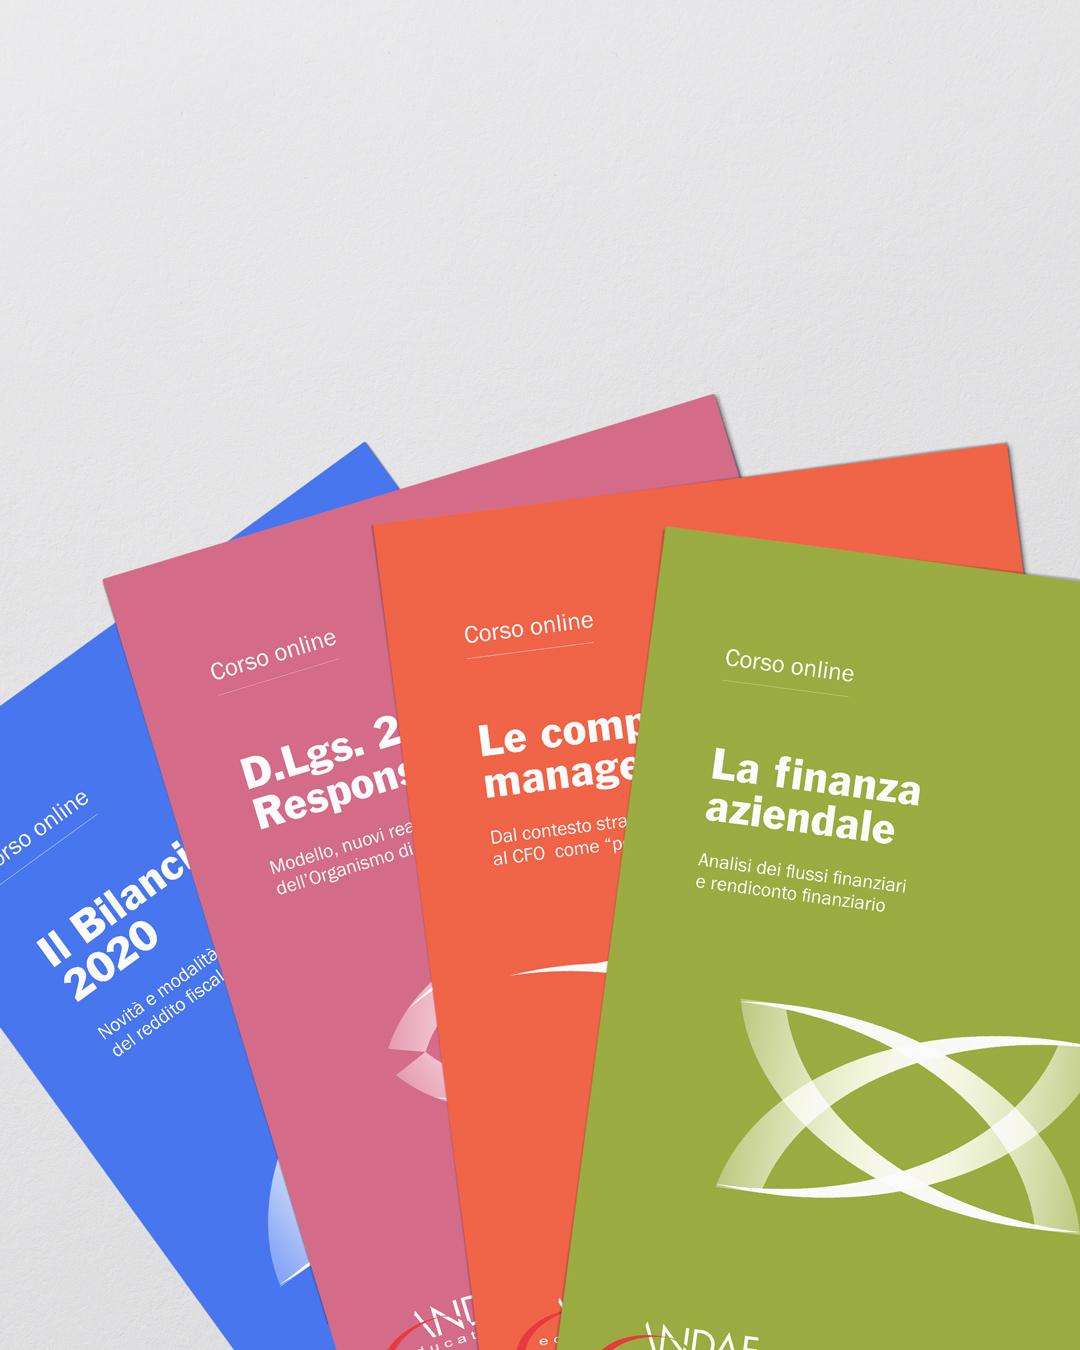 Andaf visual design graphic flyers drogheria studio